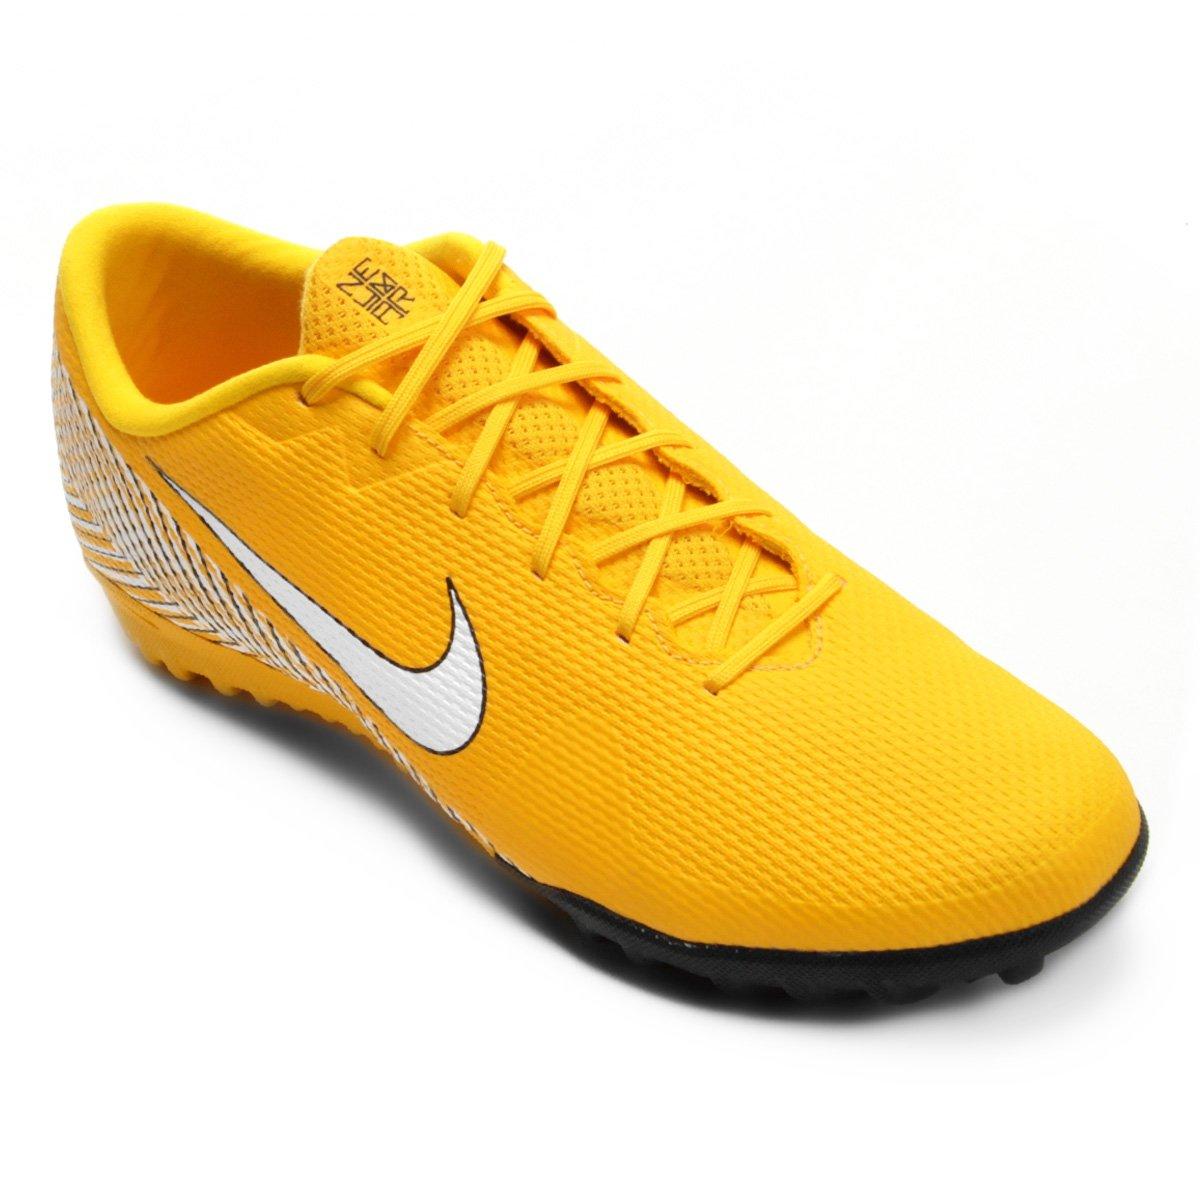 Chuteira Society Nike Mercurial Vapor 12 Academy Neymar TF Masculina . d5cfcb9a1eeff